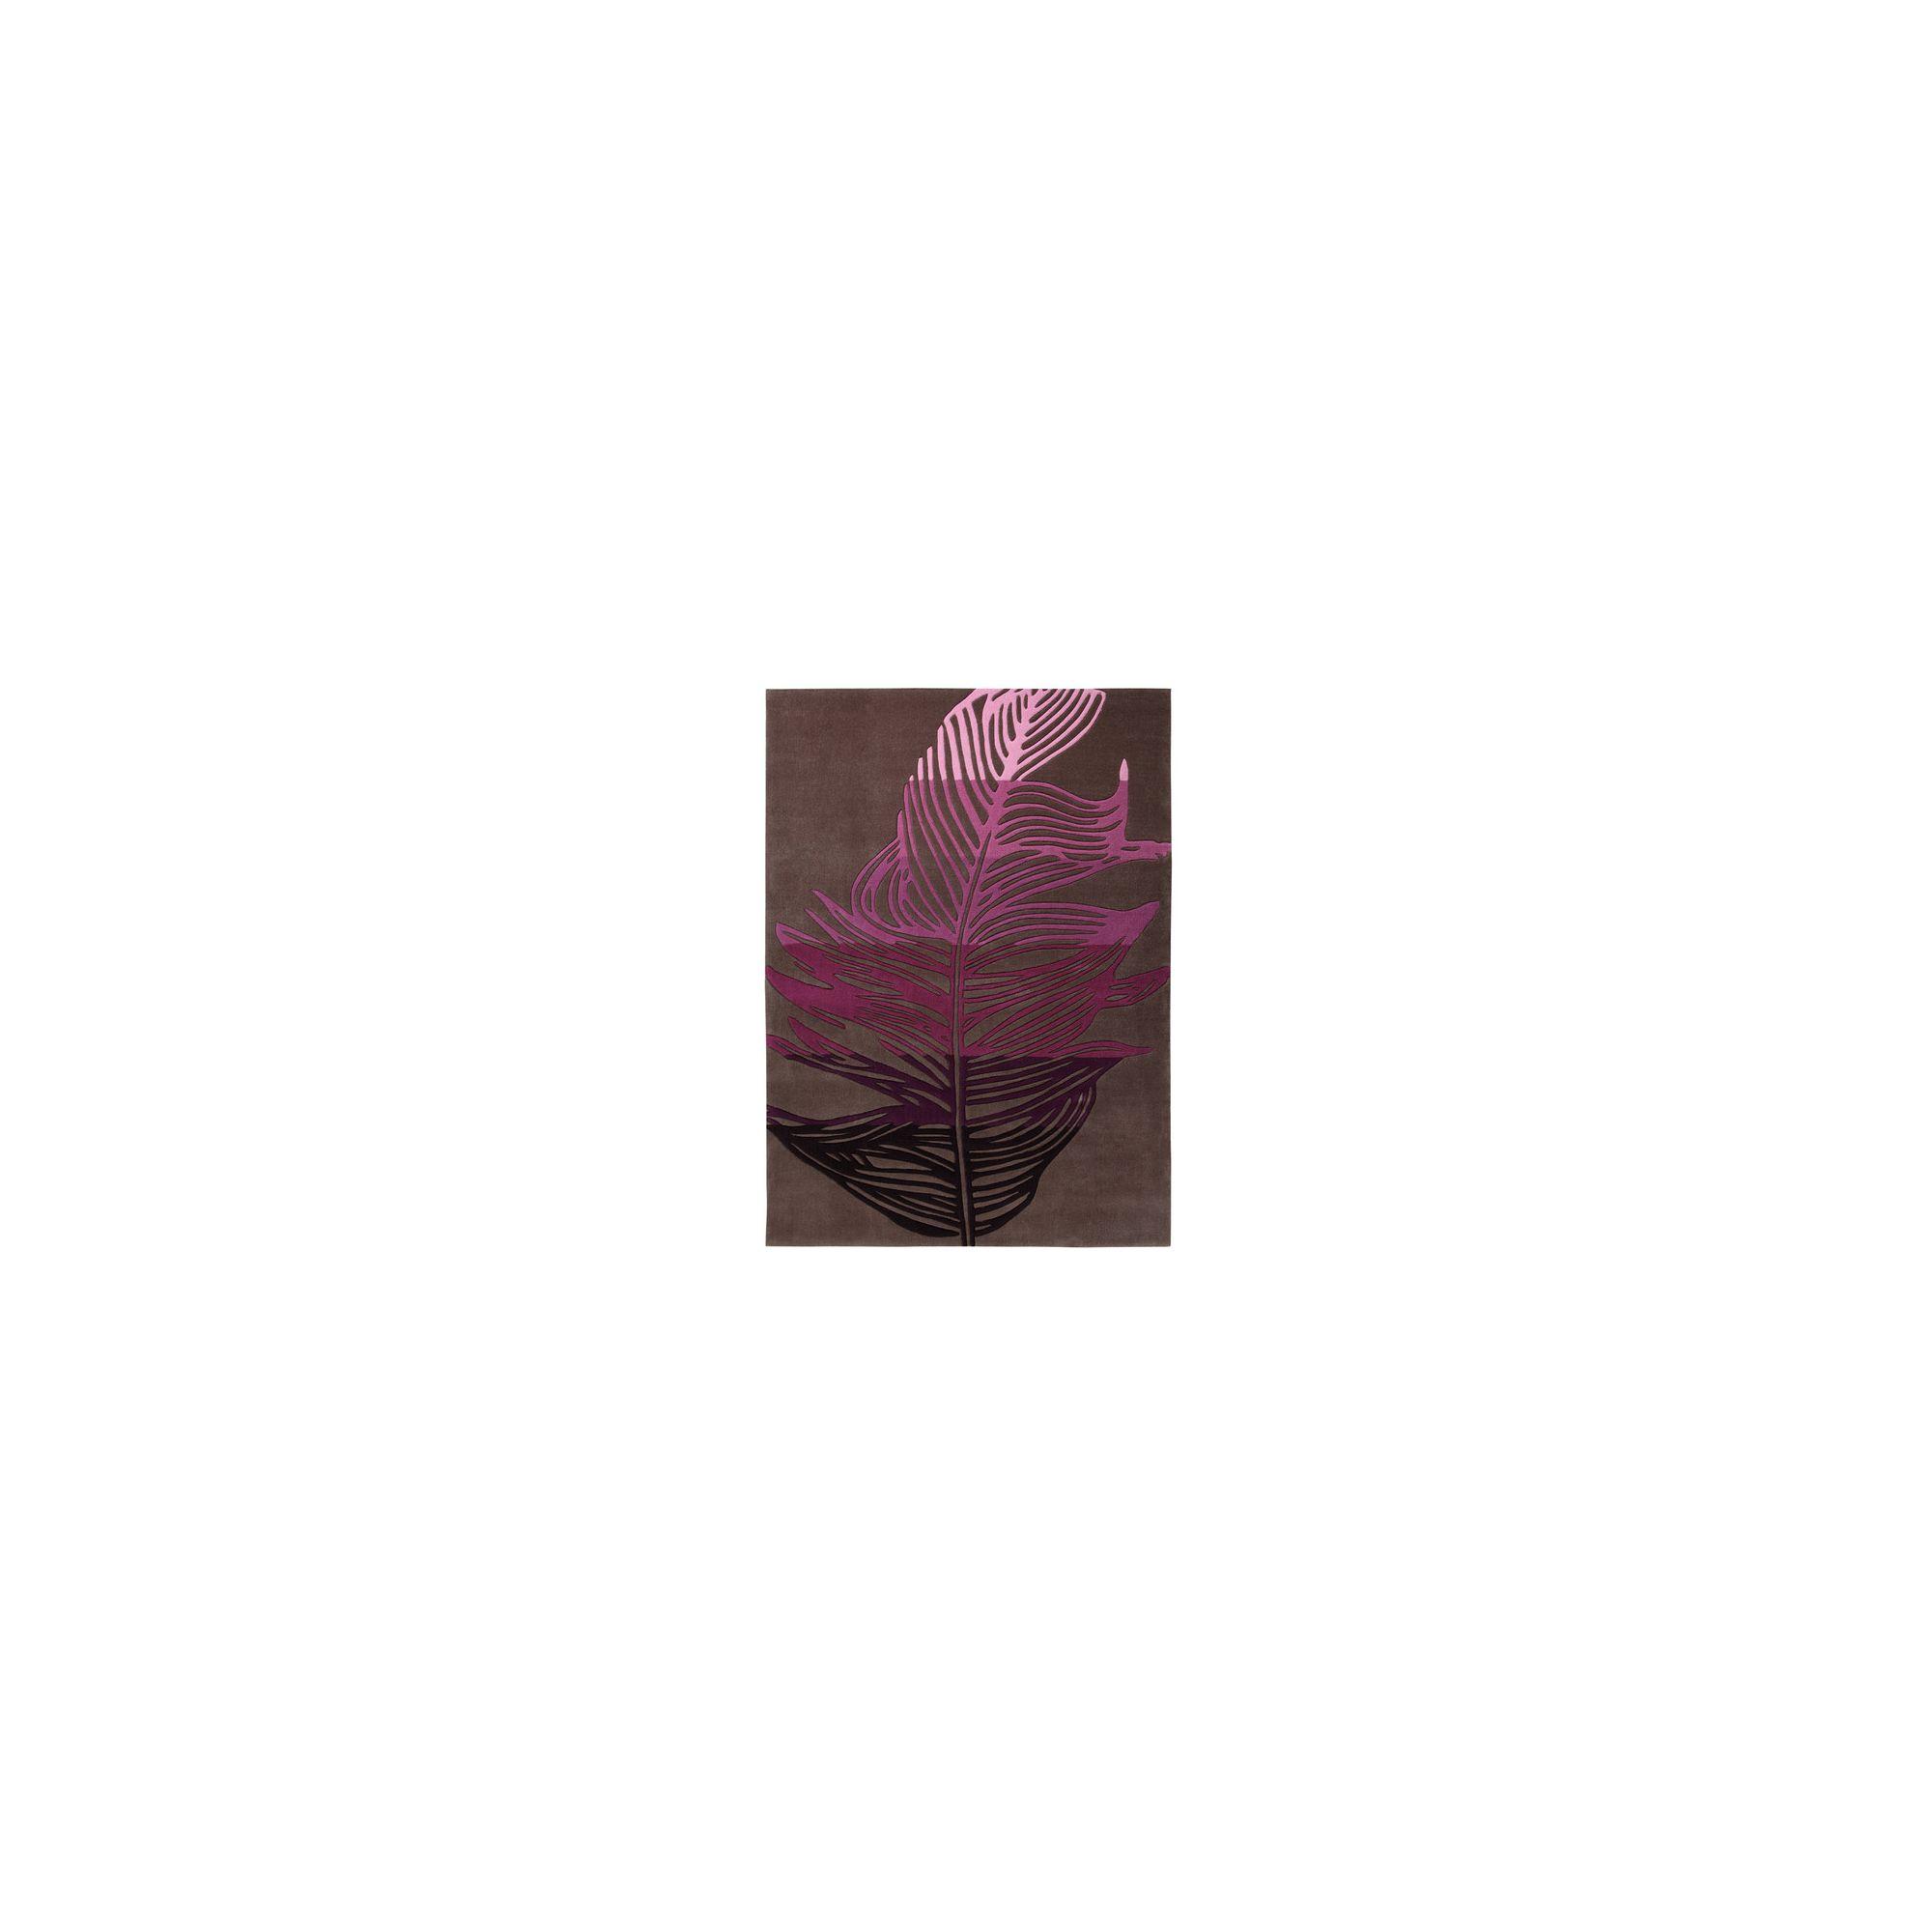 Esprit Feather Brown / Purple Novelty Rug - 140cm x 200cm